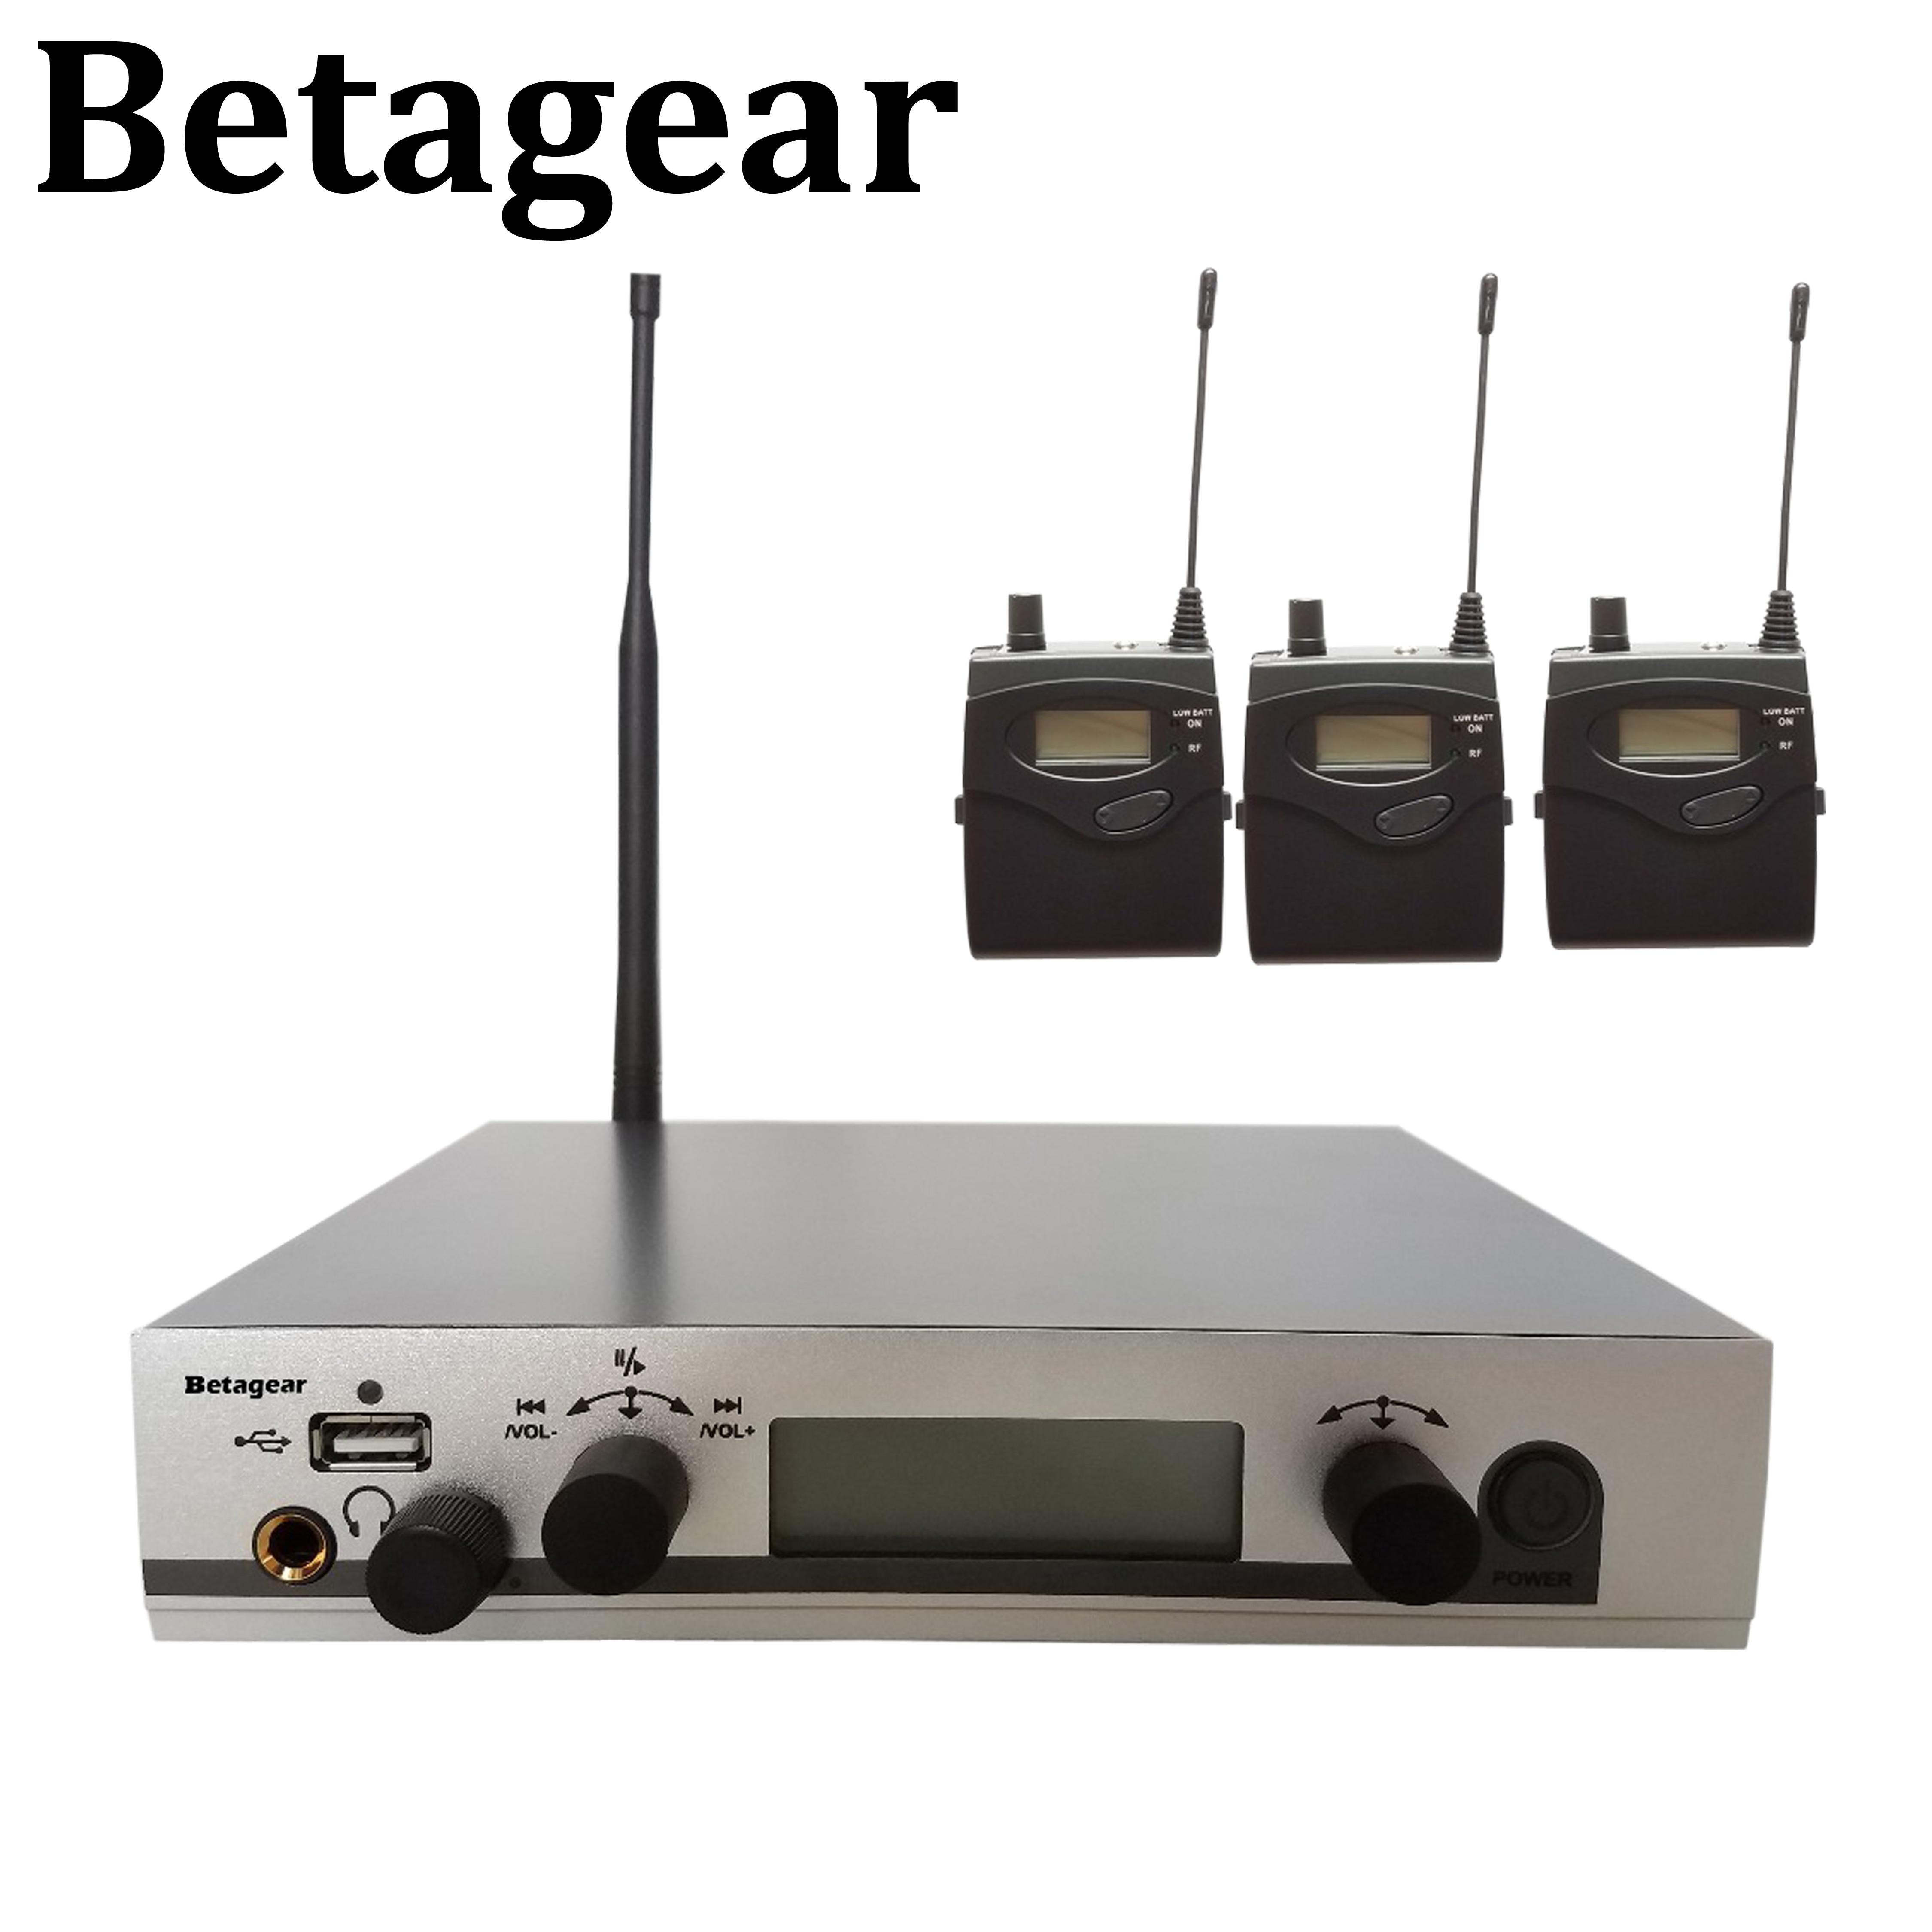 Betagear-نظام مراقبة داخل الأذن ، 300IEM G3 SR300 IEM ، مراقب شخصي ، نظام لاسلكي داخل الأذن ، صوت احترافي